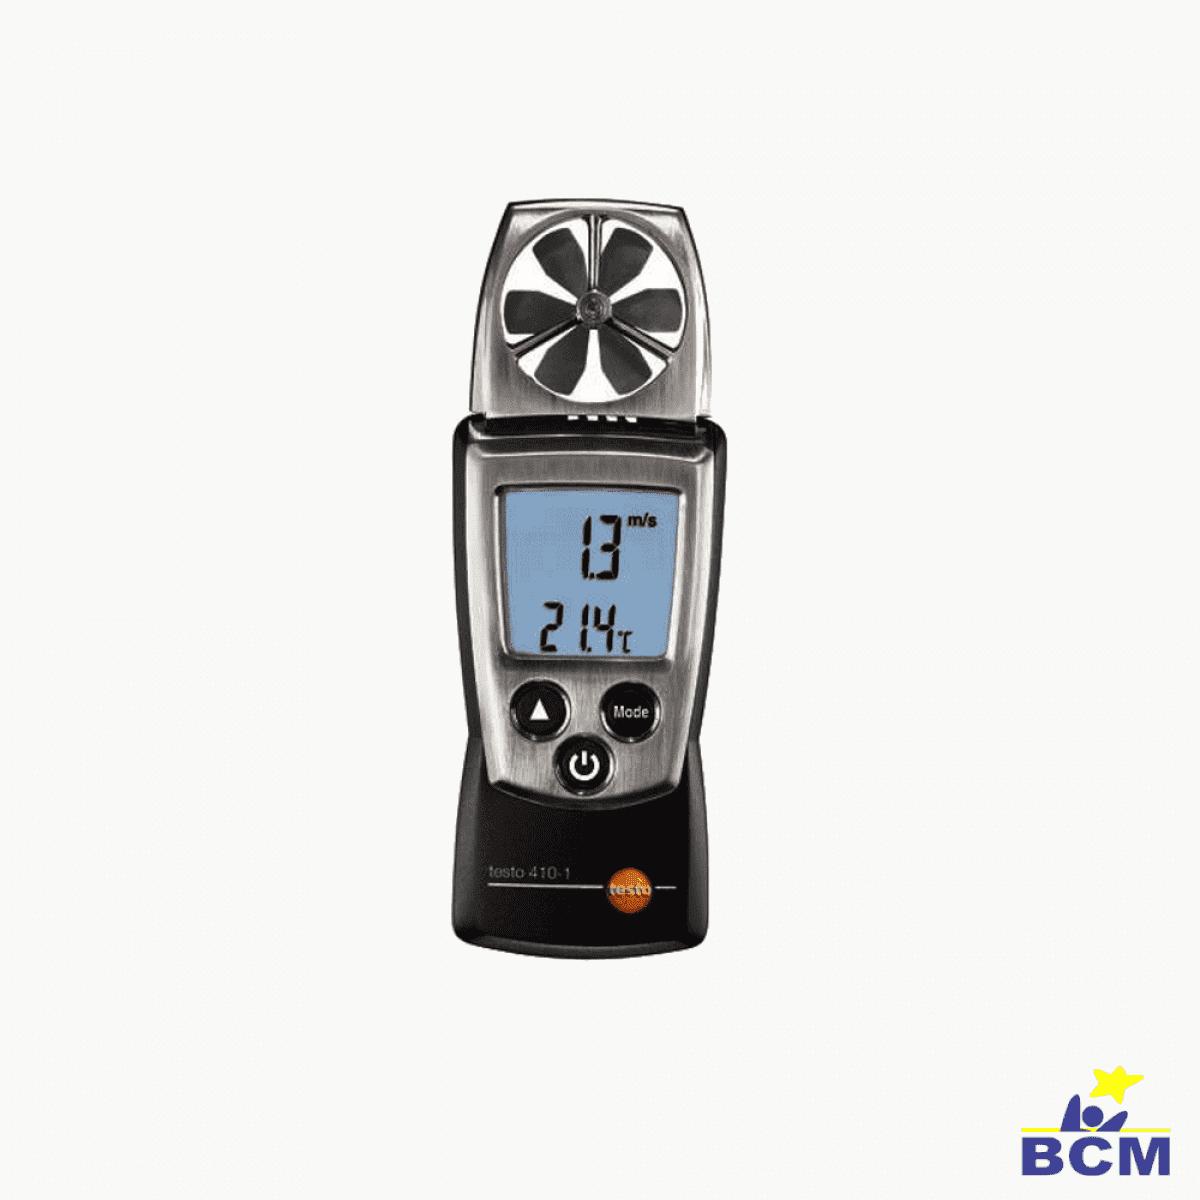 testo 410-1 Anemômetro BCM